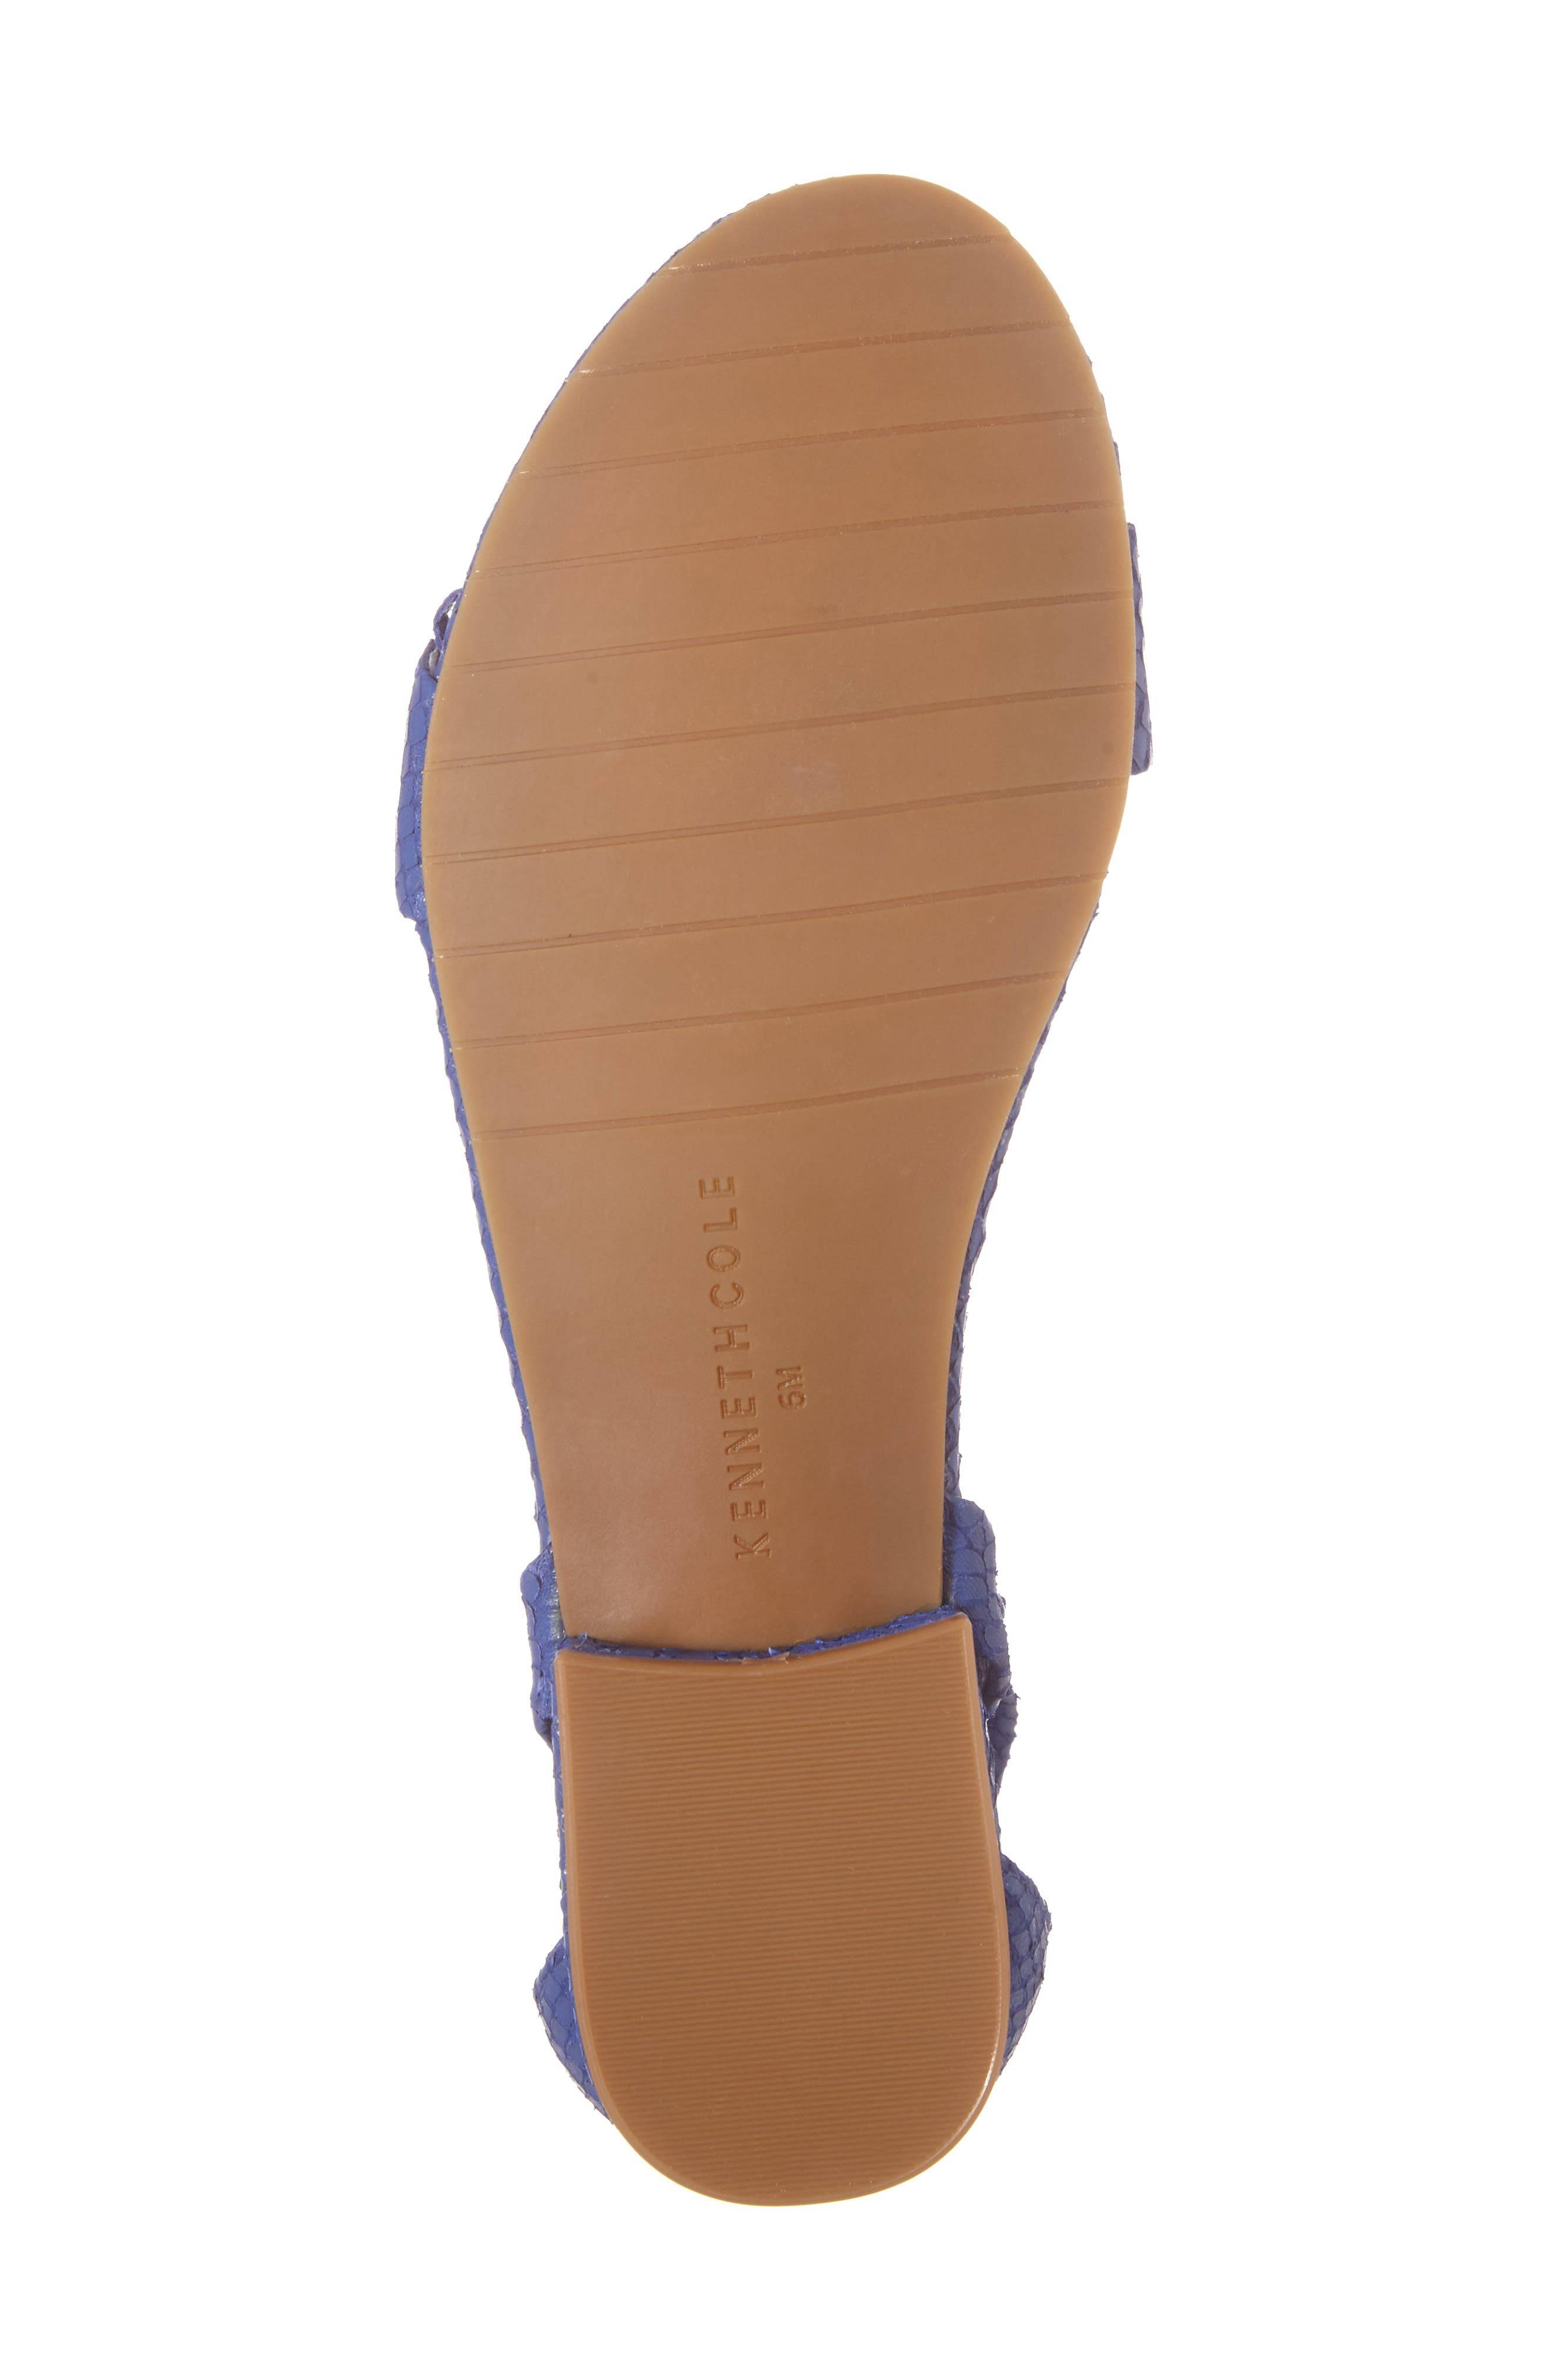 Valen Tassel Lace-Up Sandal,                             Alternate thumbnail 65, color,